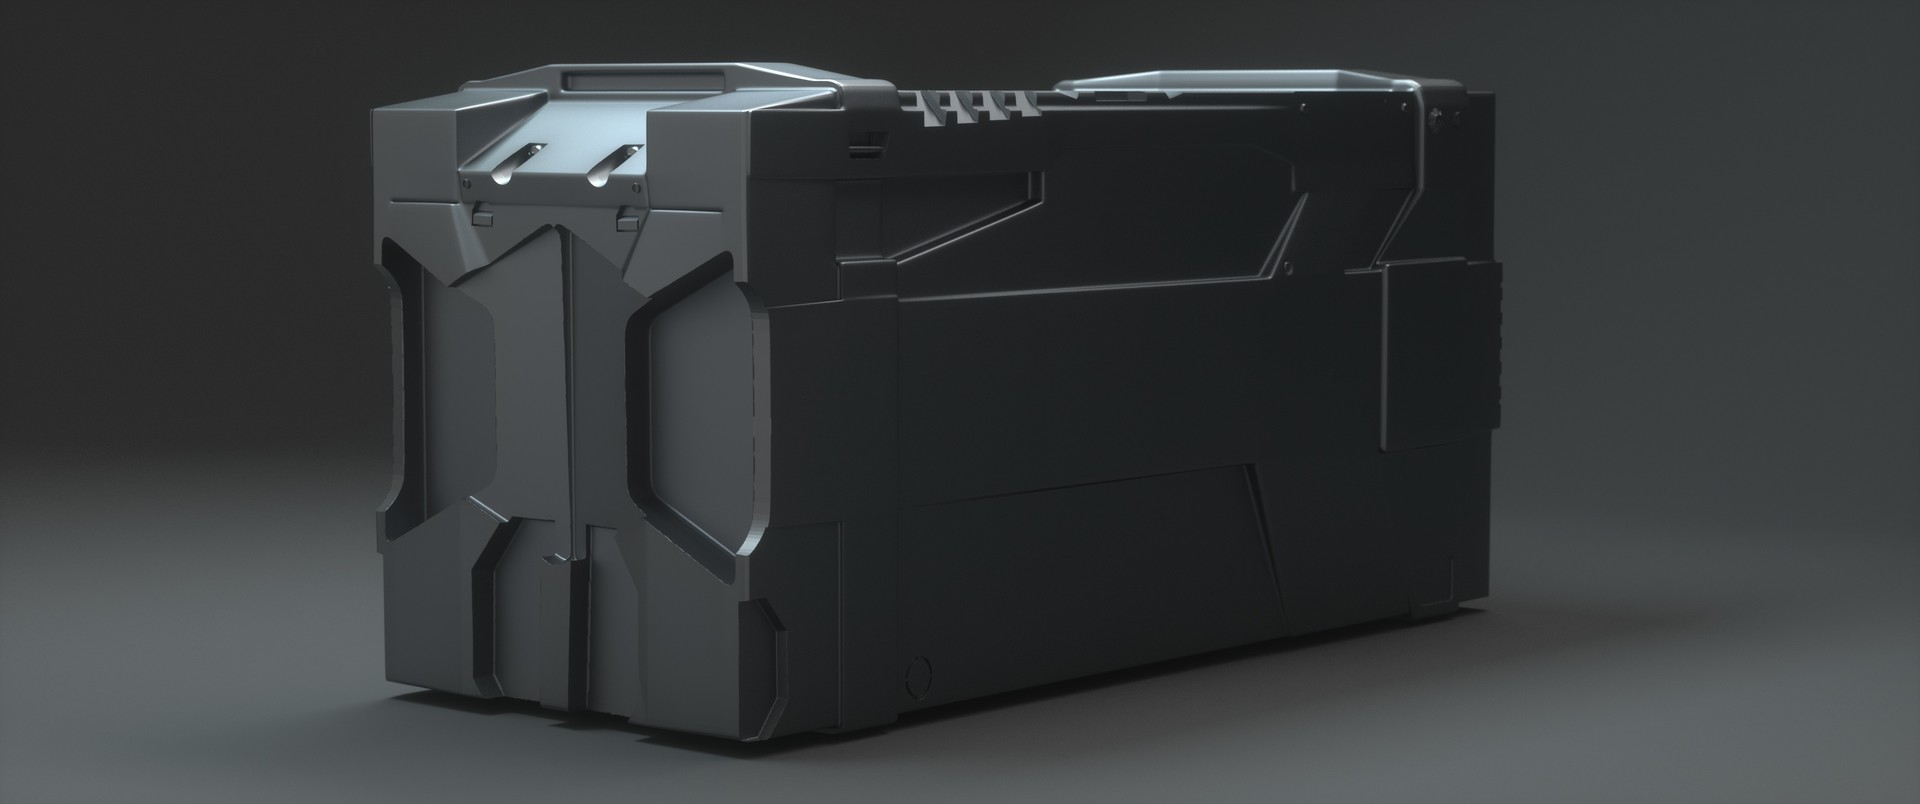 Kresimir jelusic robob3ar 493 breaking the box6